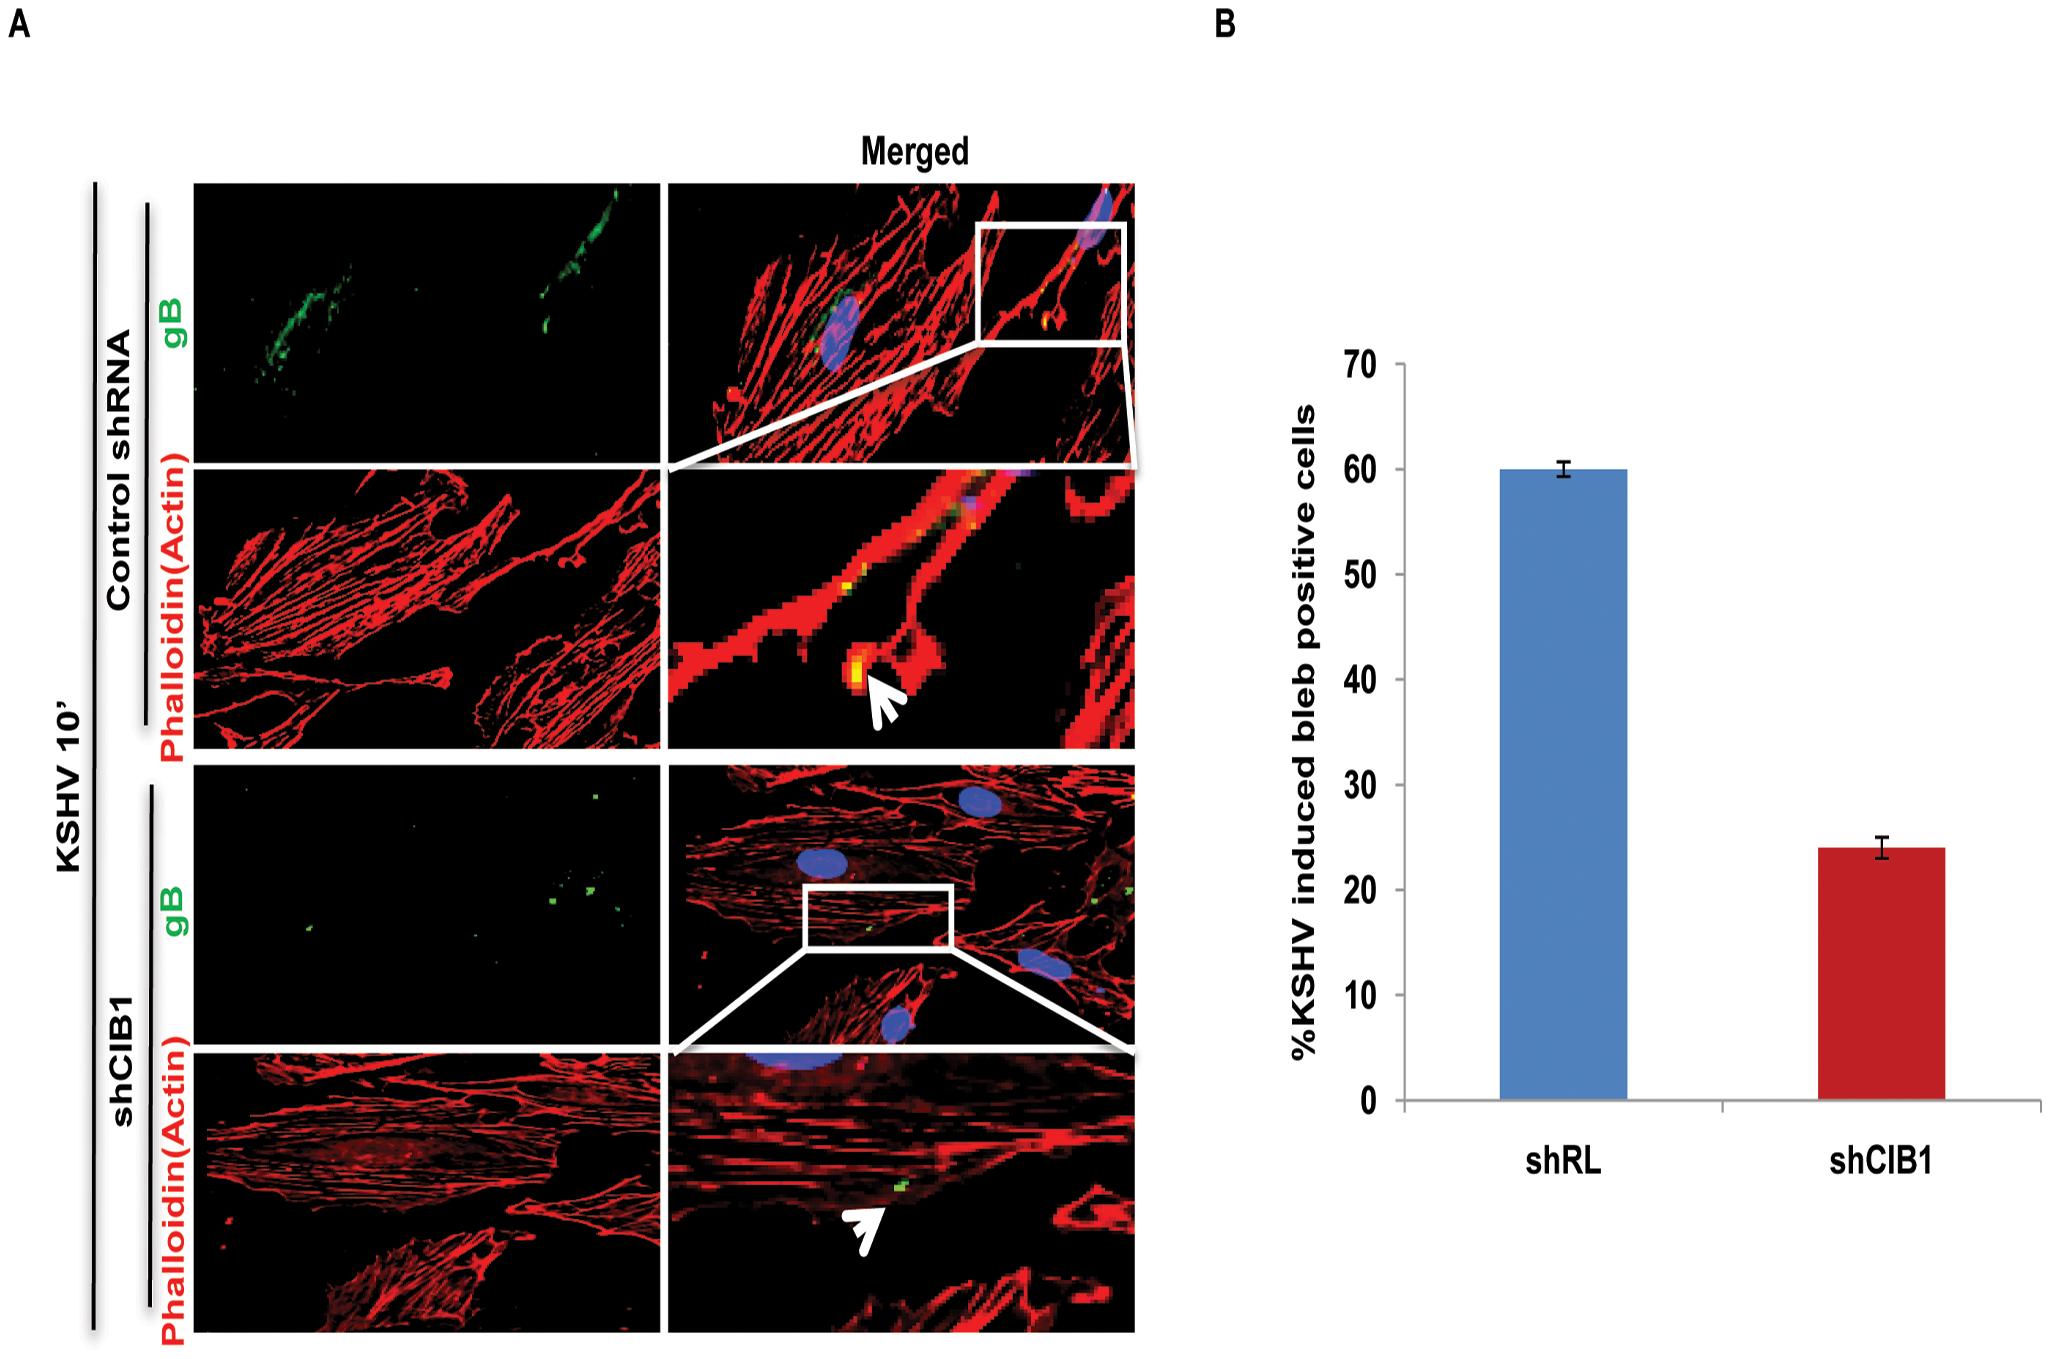 Effect of CIB1 knockdown on macropinocytic uptake of KSHV during <i>de novo</i> infection of endothelial cells.